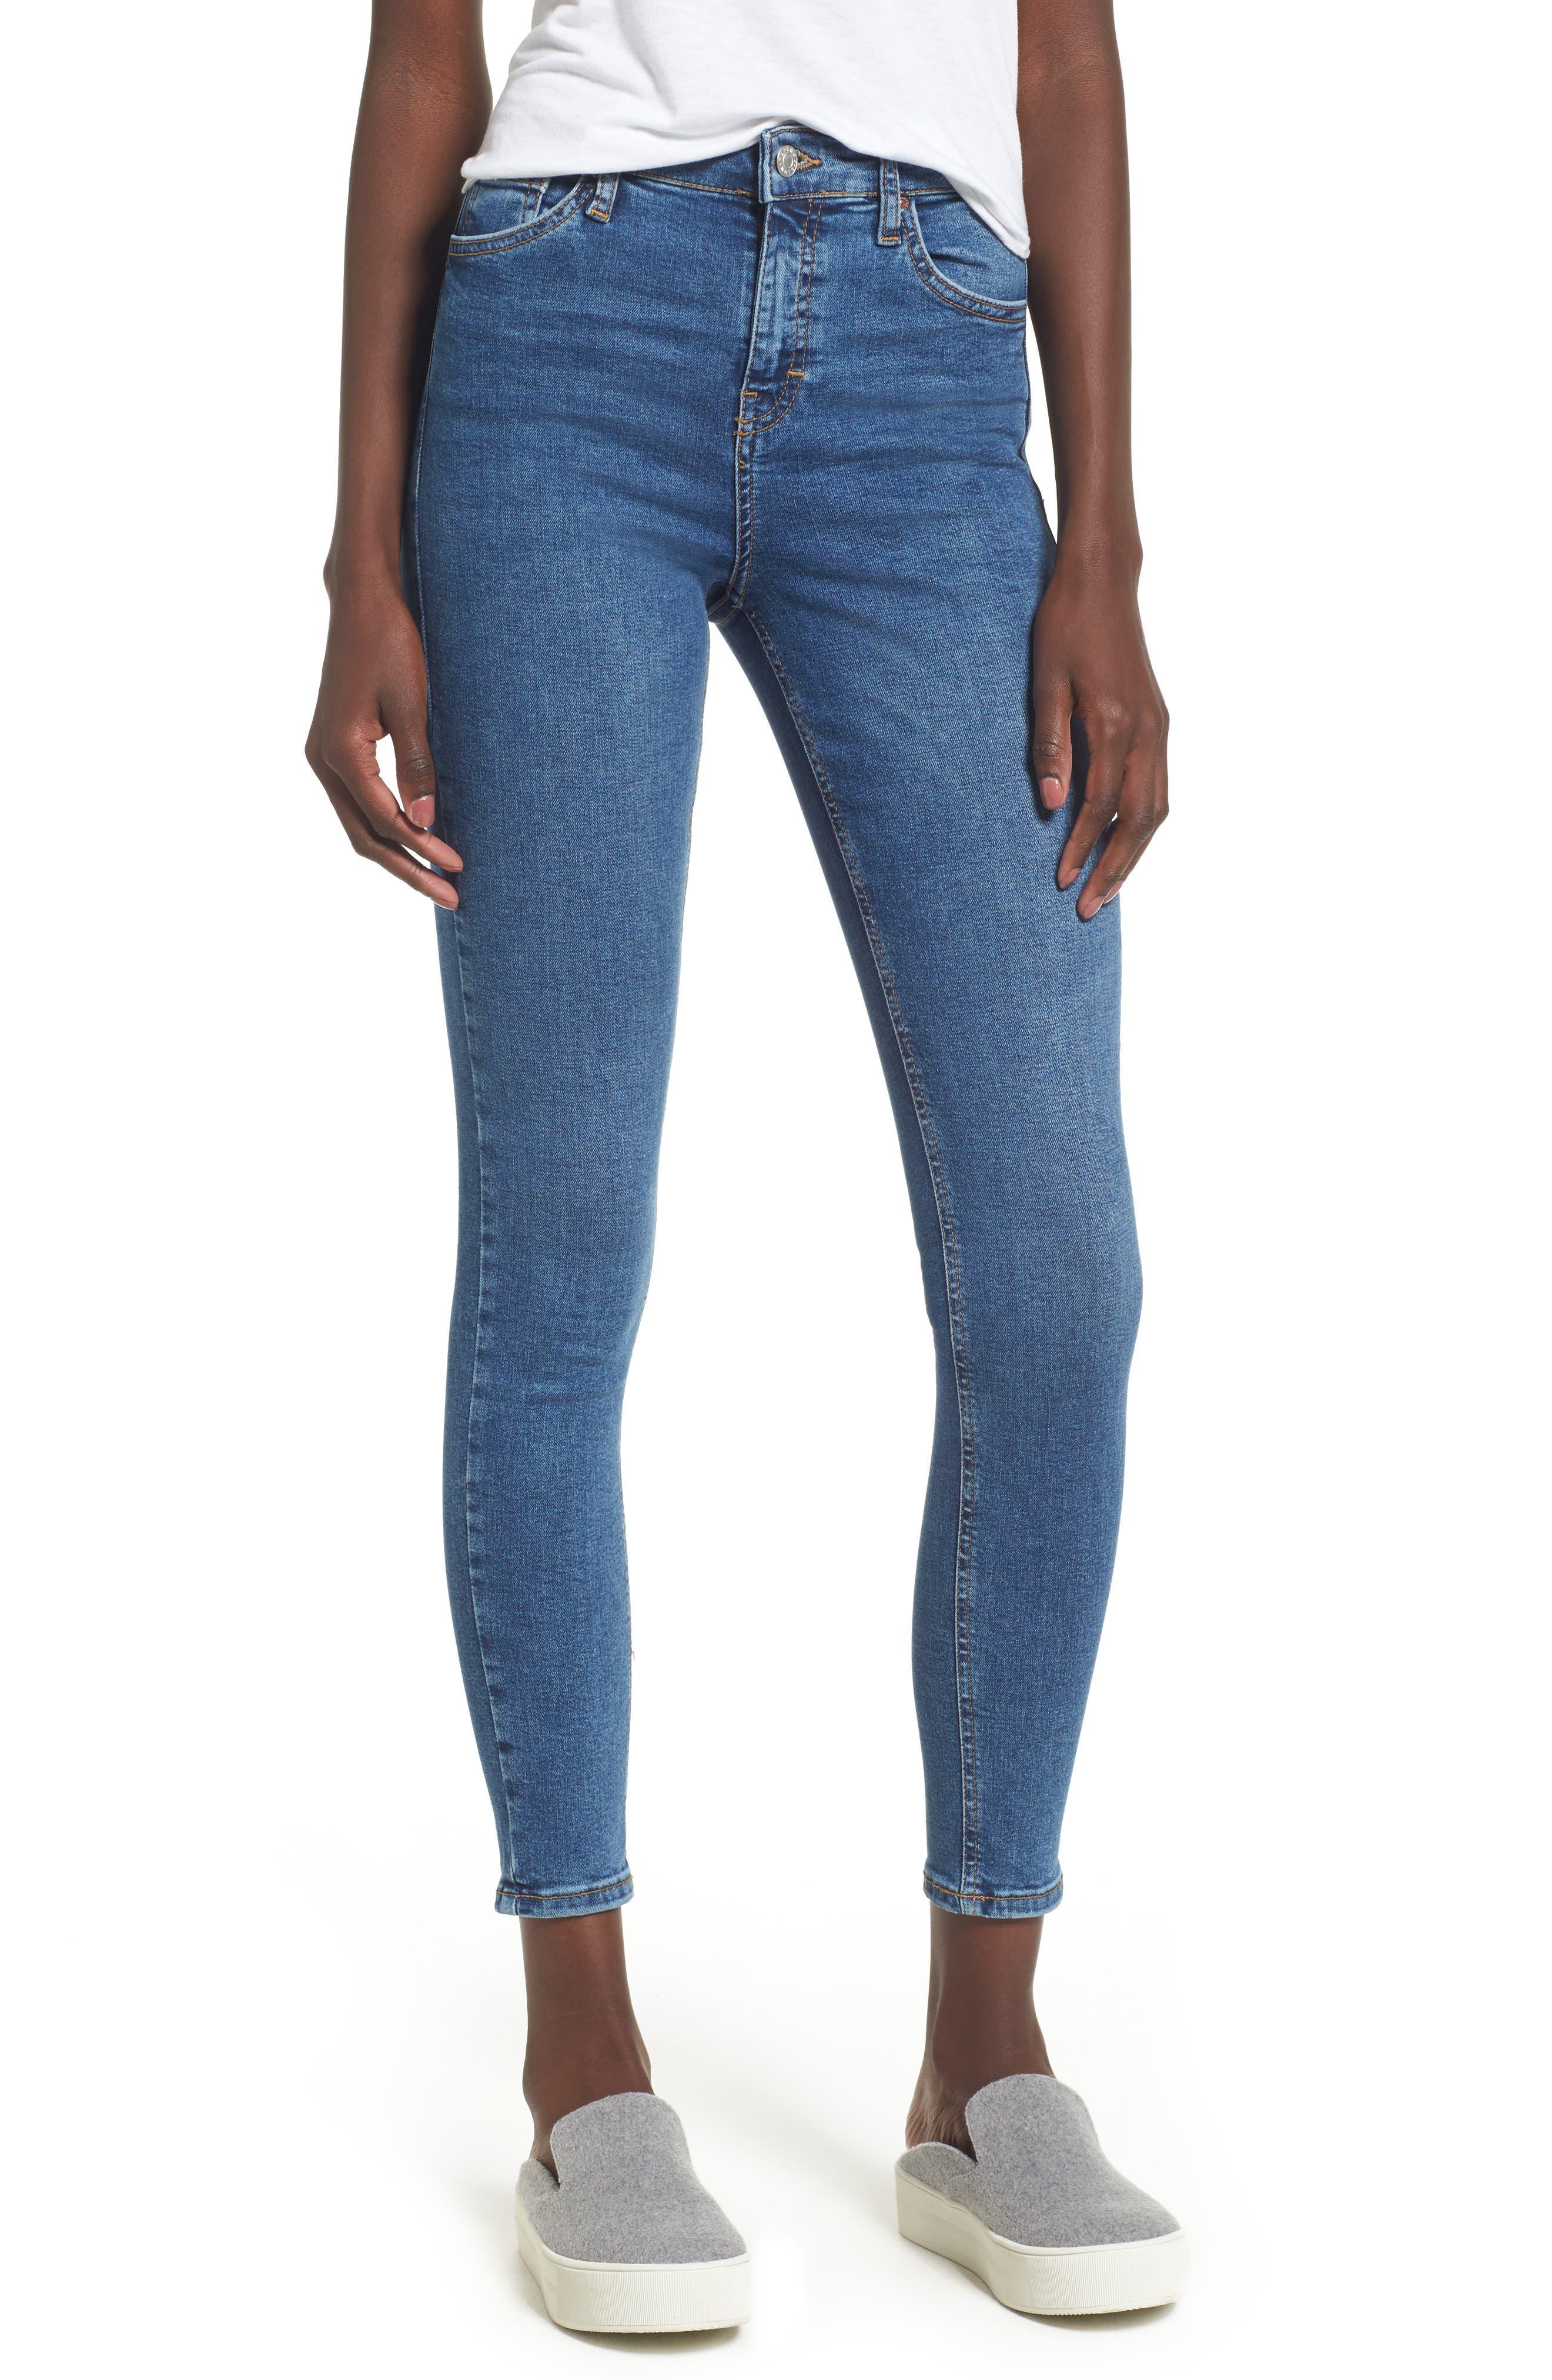 Jamie Indigo High Waist Skinny Jeans,                             Main thumbnail 1, color,                             401